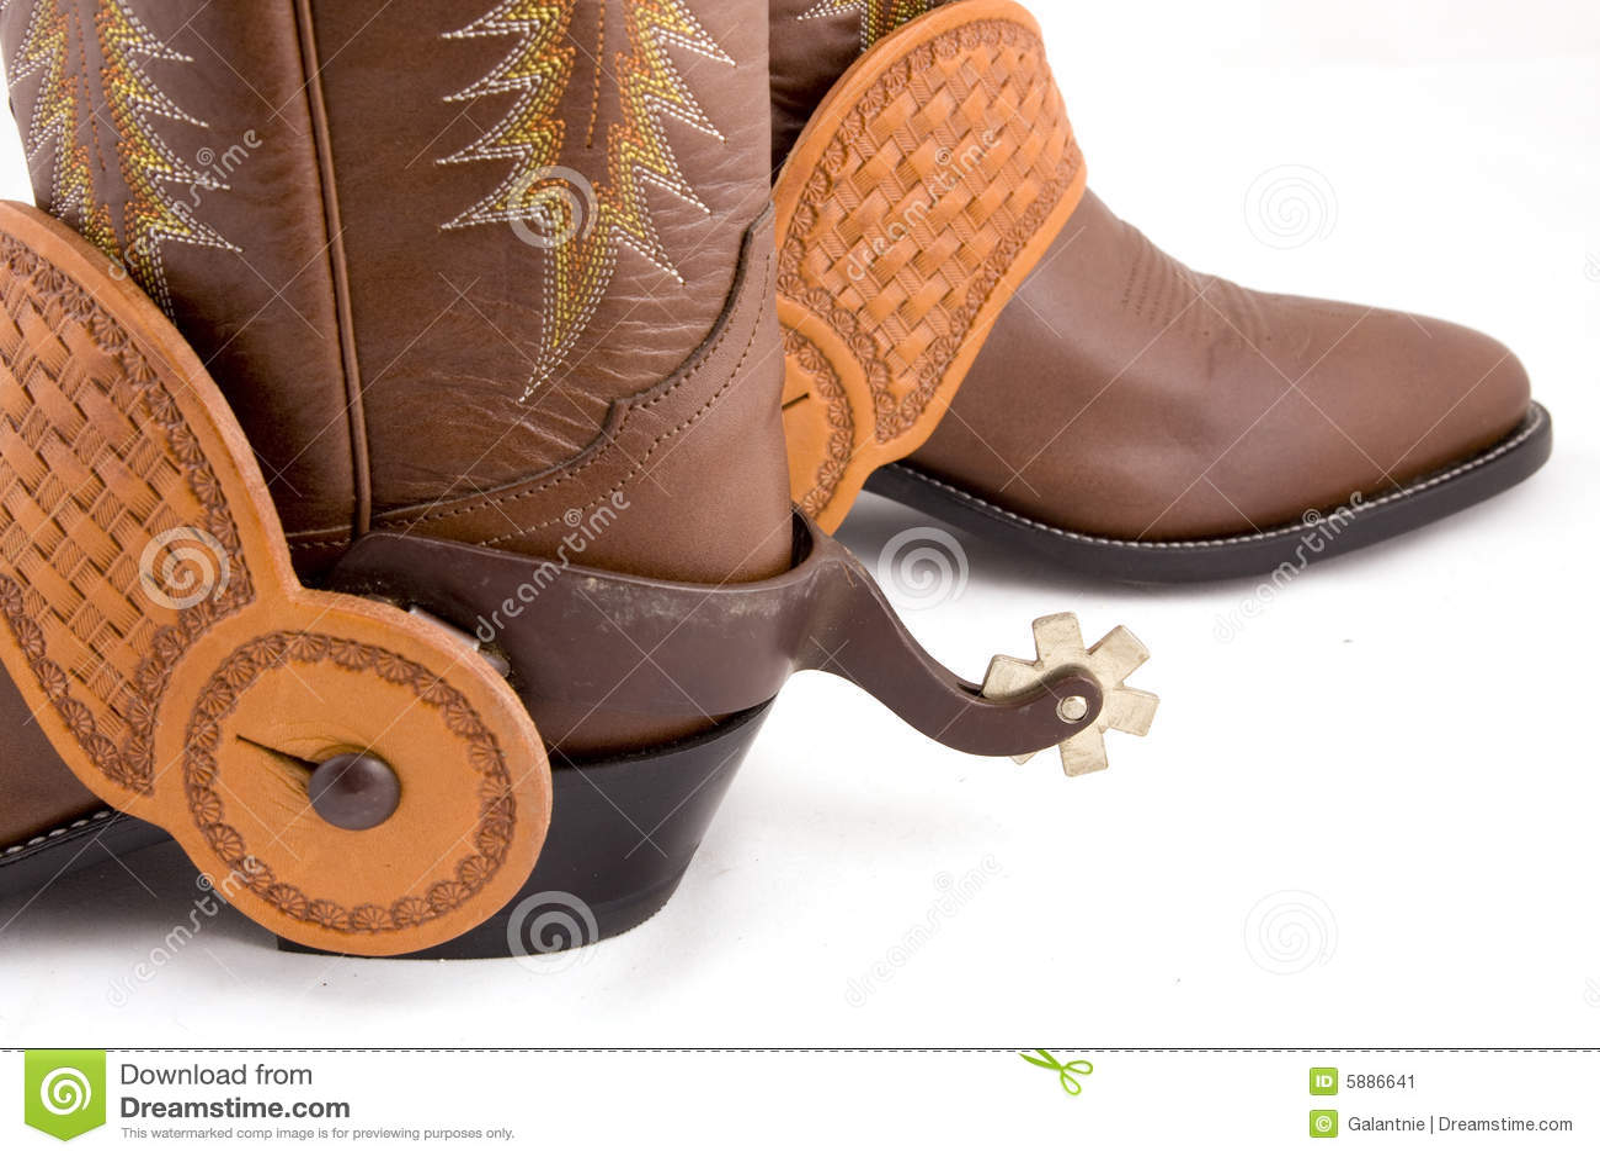 Cowboy Gear Stock Image Image 5886641